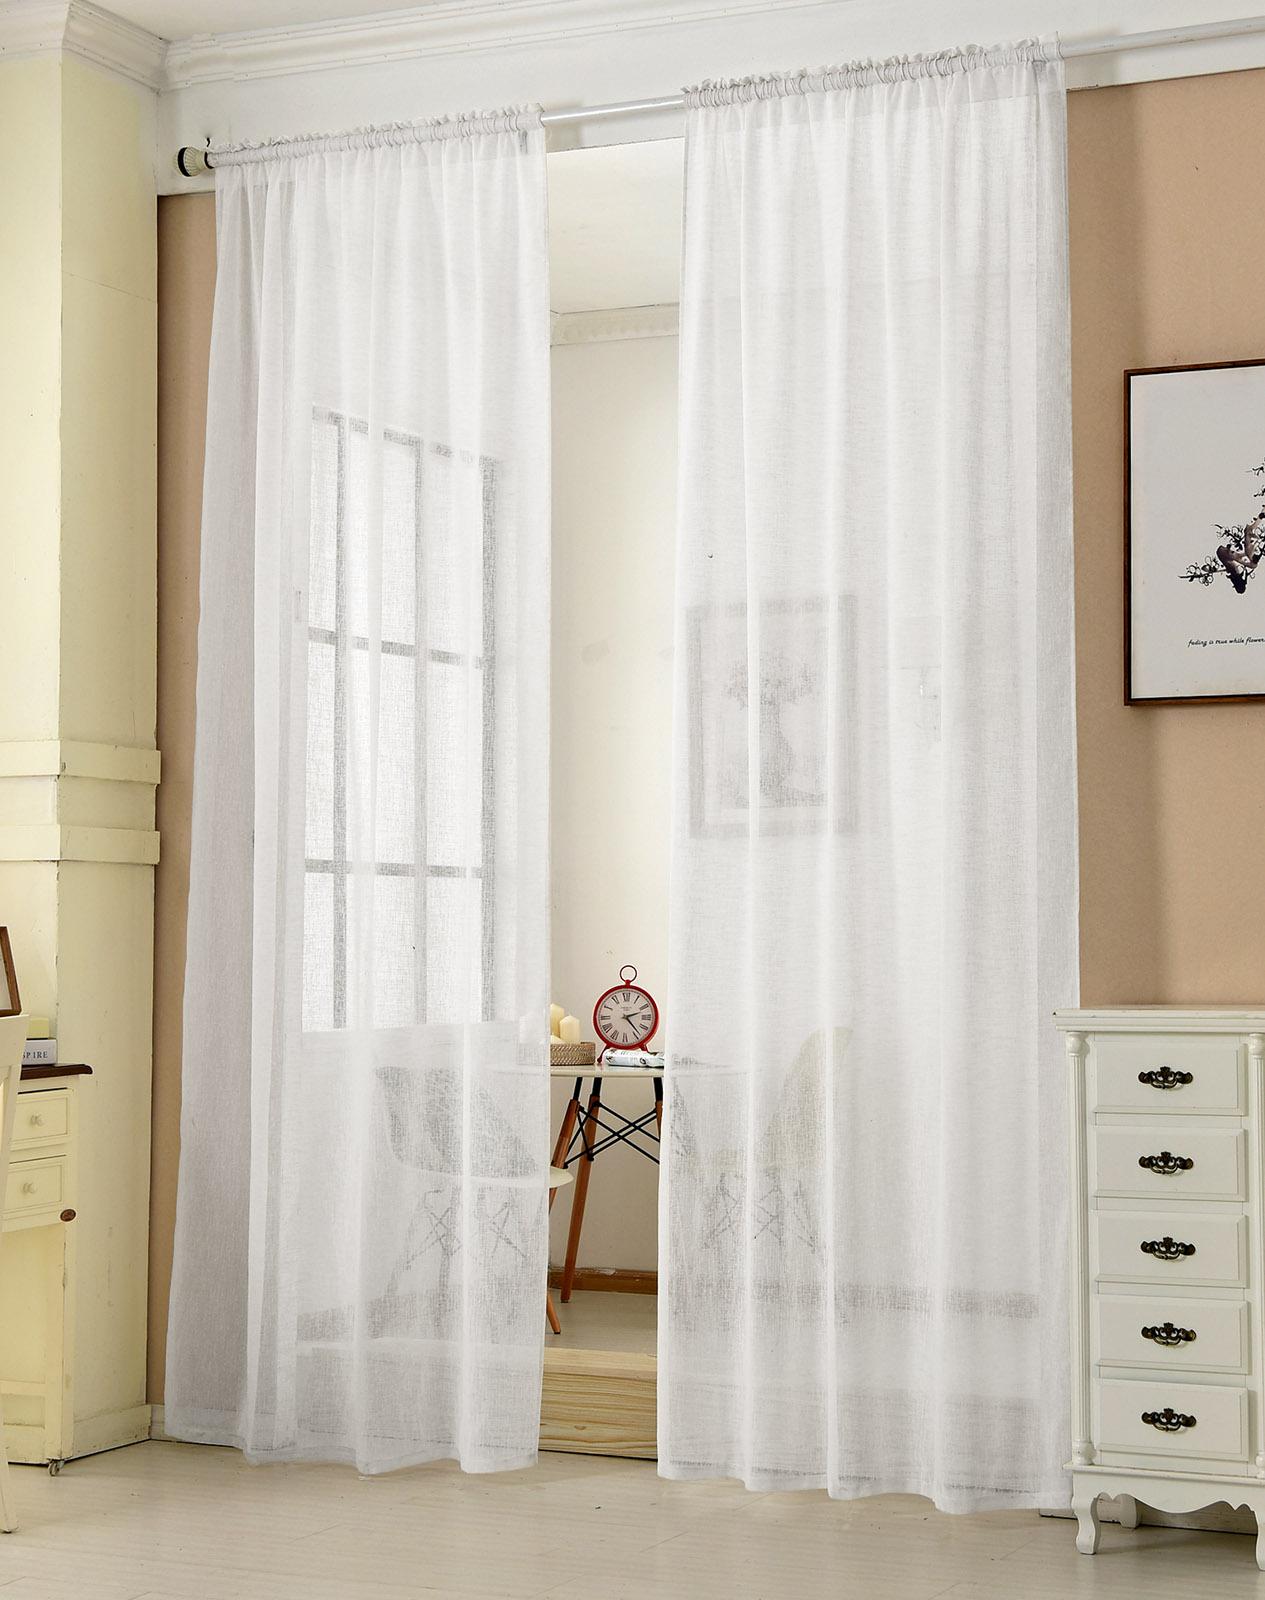 2x gardine kr uselband transparent leinenoptik dekoschal 140x225 wei vh5860ws 2 ebay. Black Bedroom Furniture Sets. Home Design Ideas